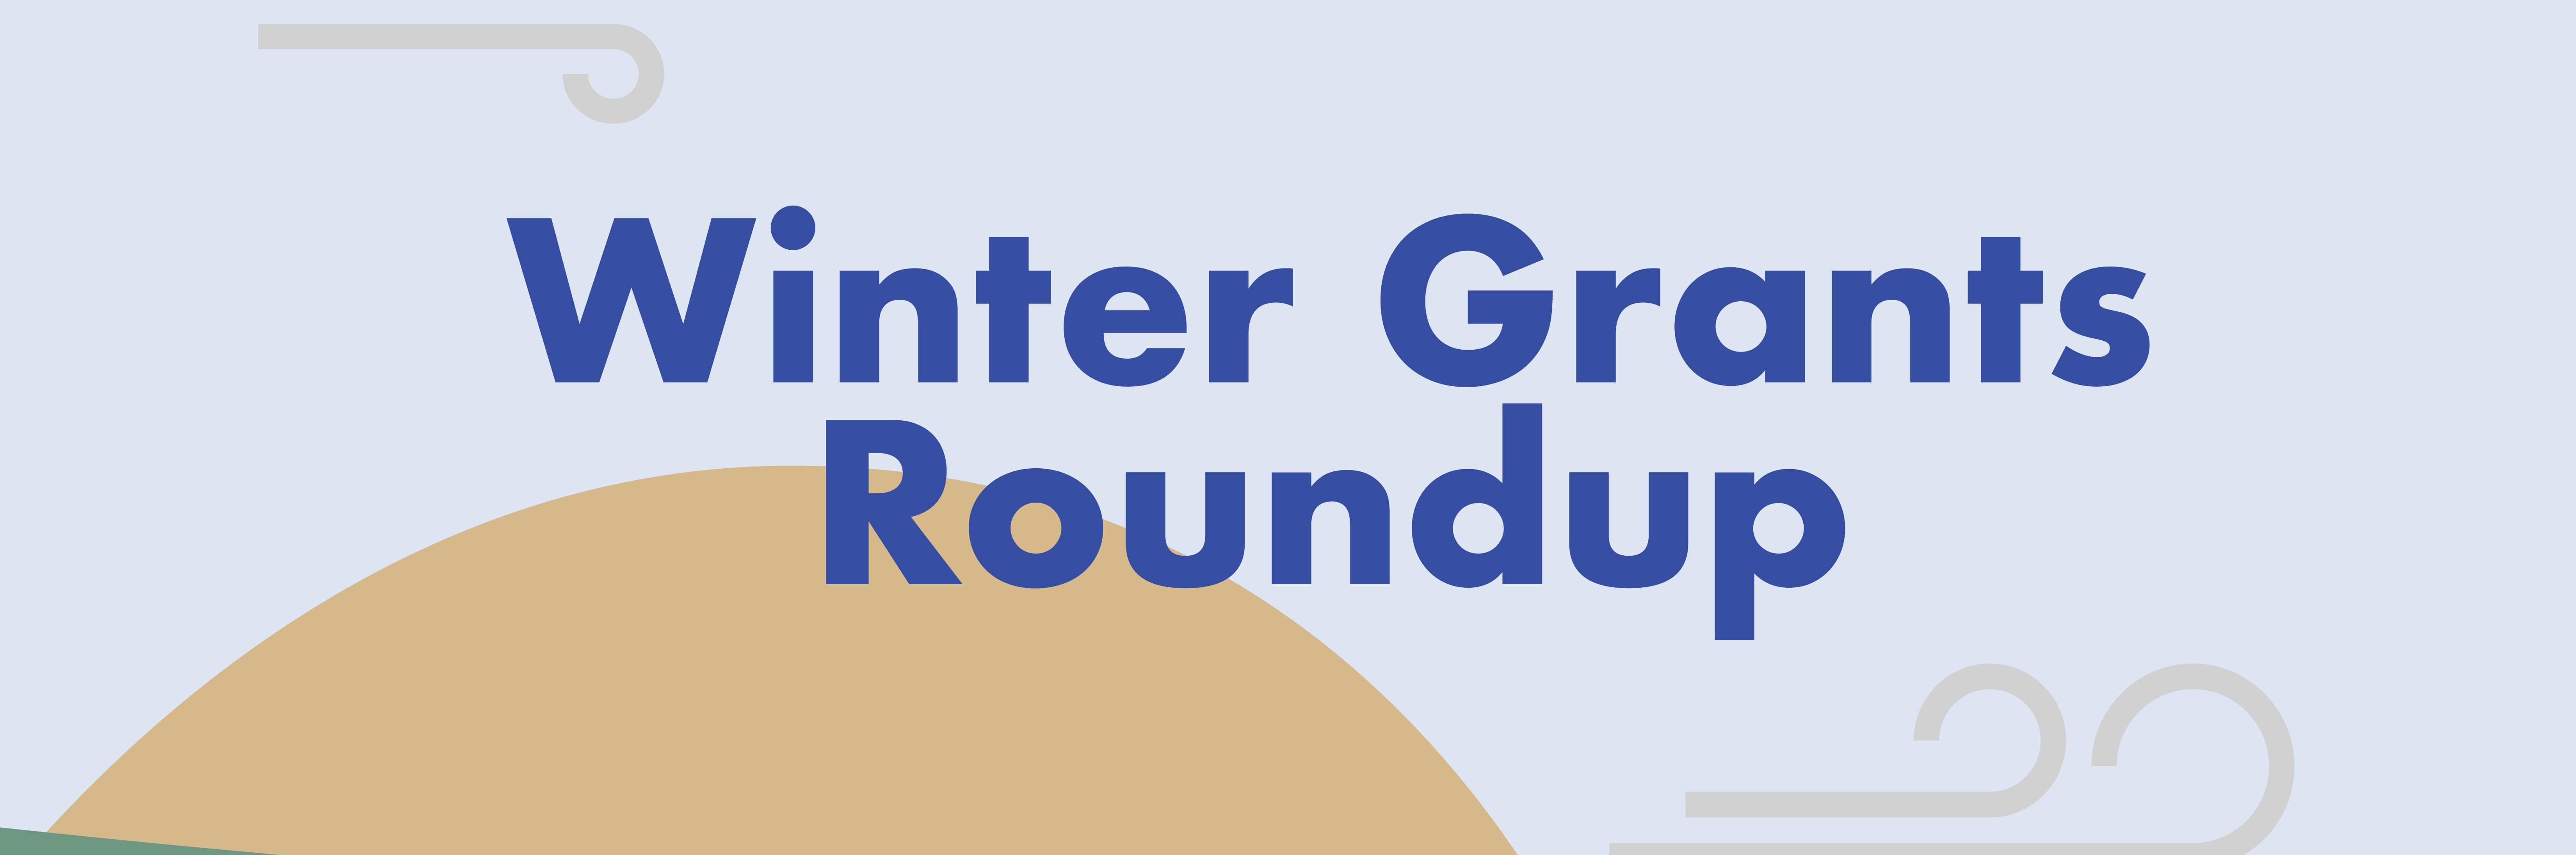 winter grants roundup